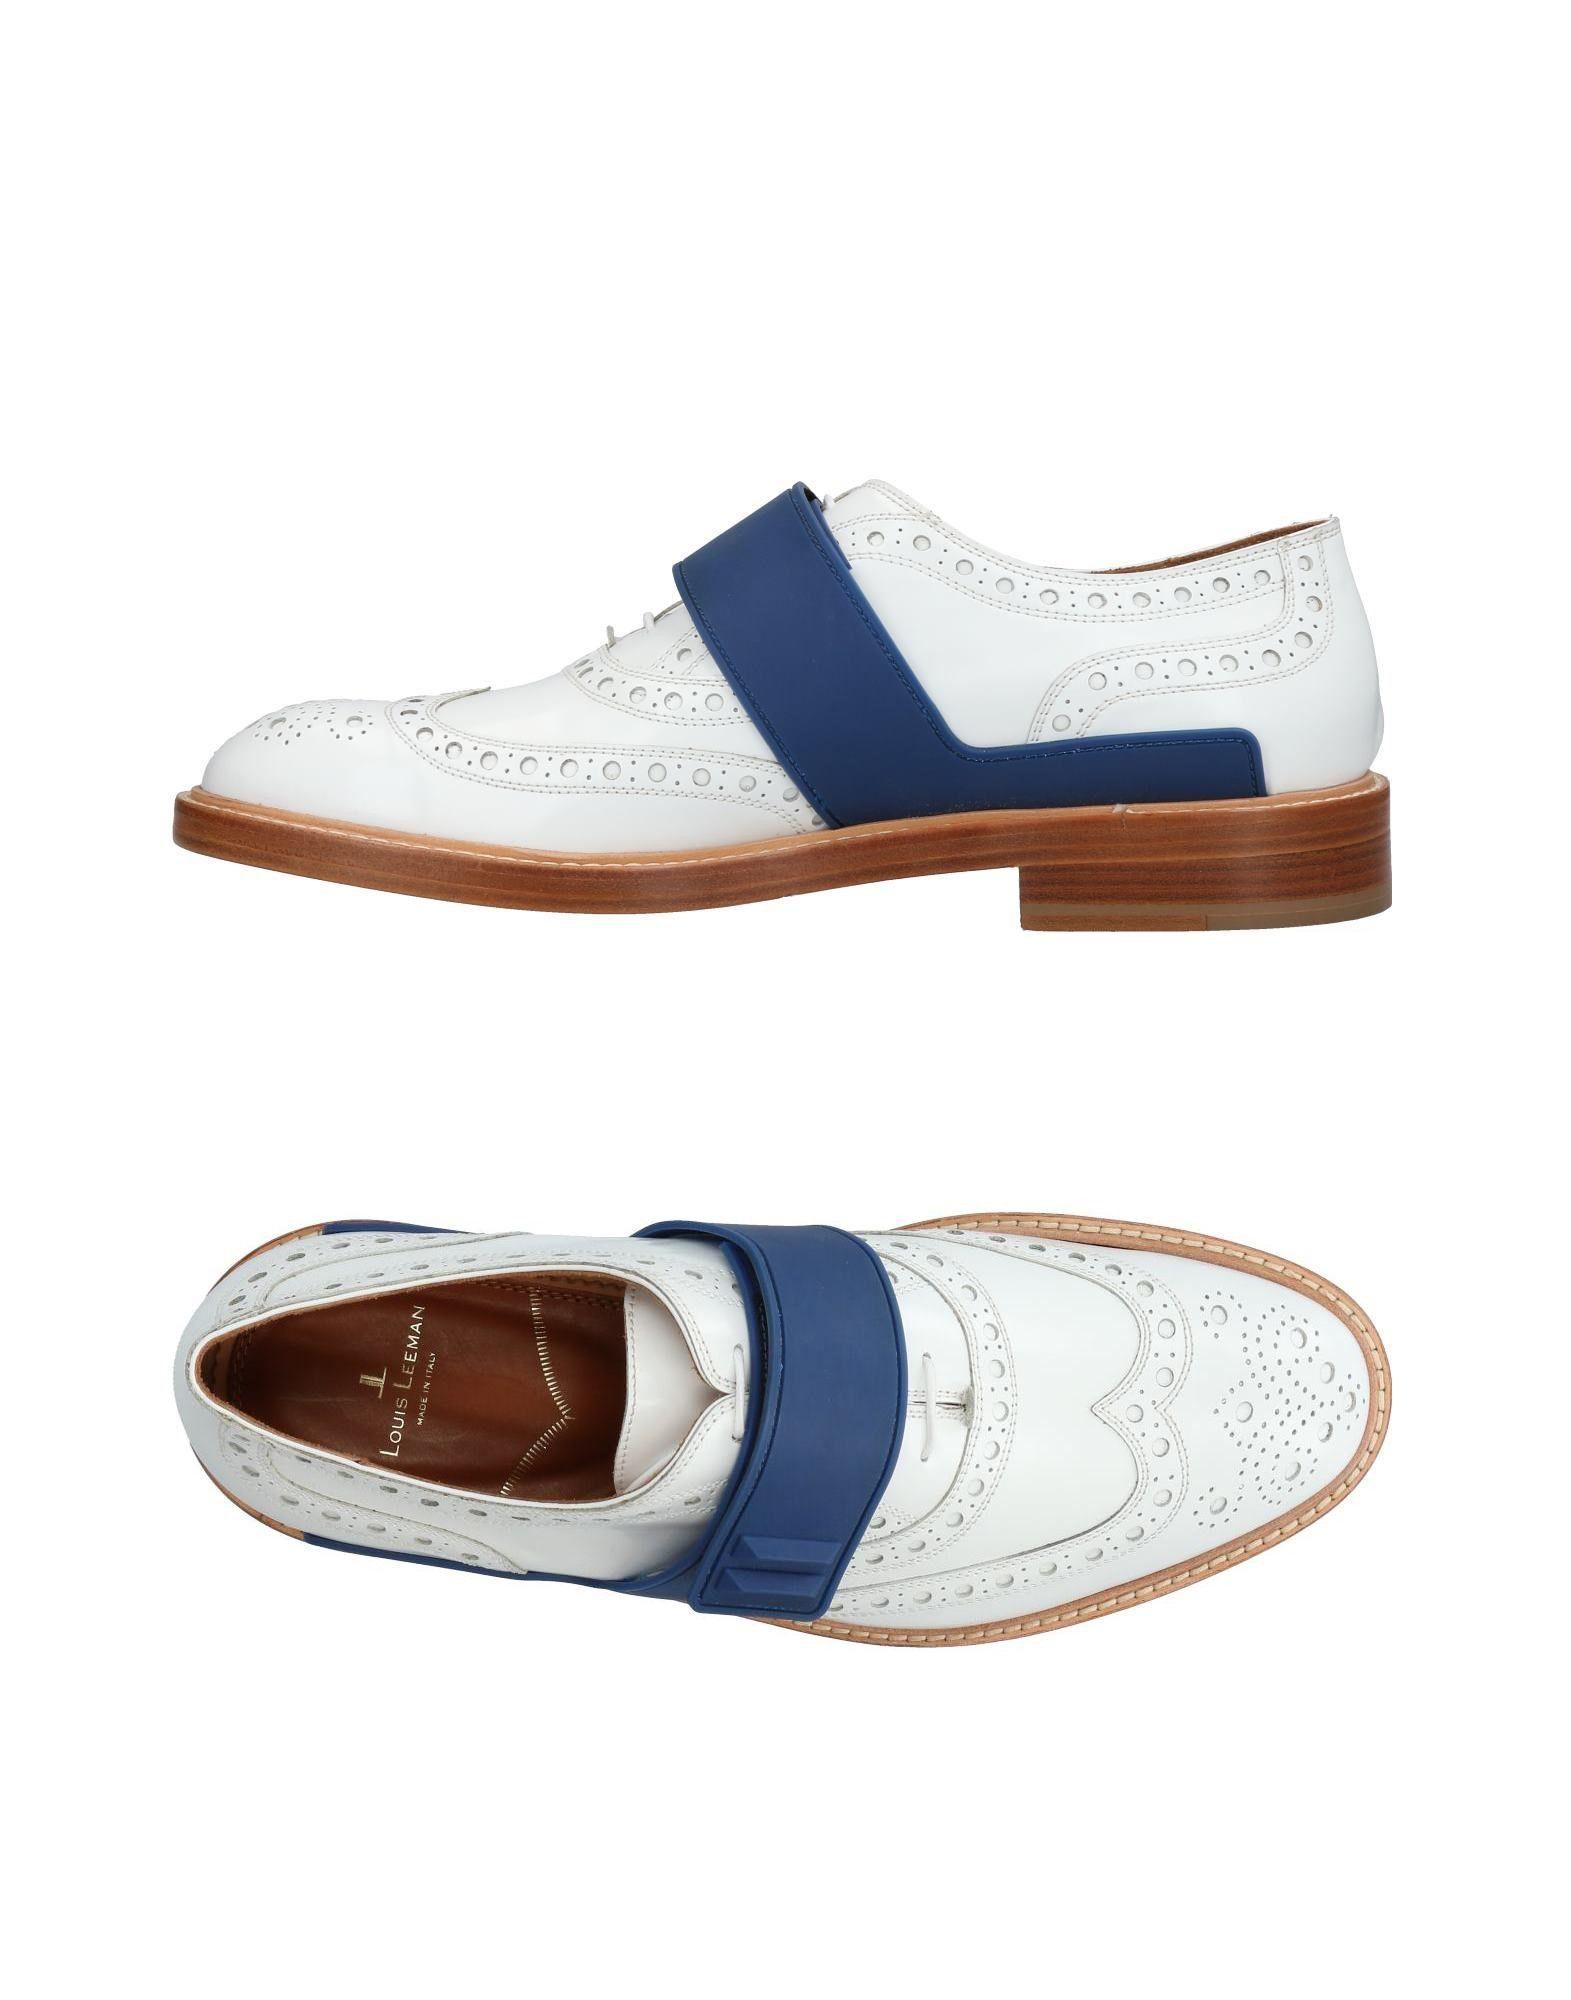 LOUIS LEEMAN Обувь на шнурках louis gerardier le bottier обувь на шнурках